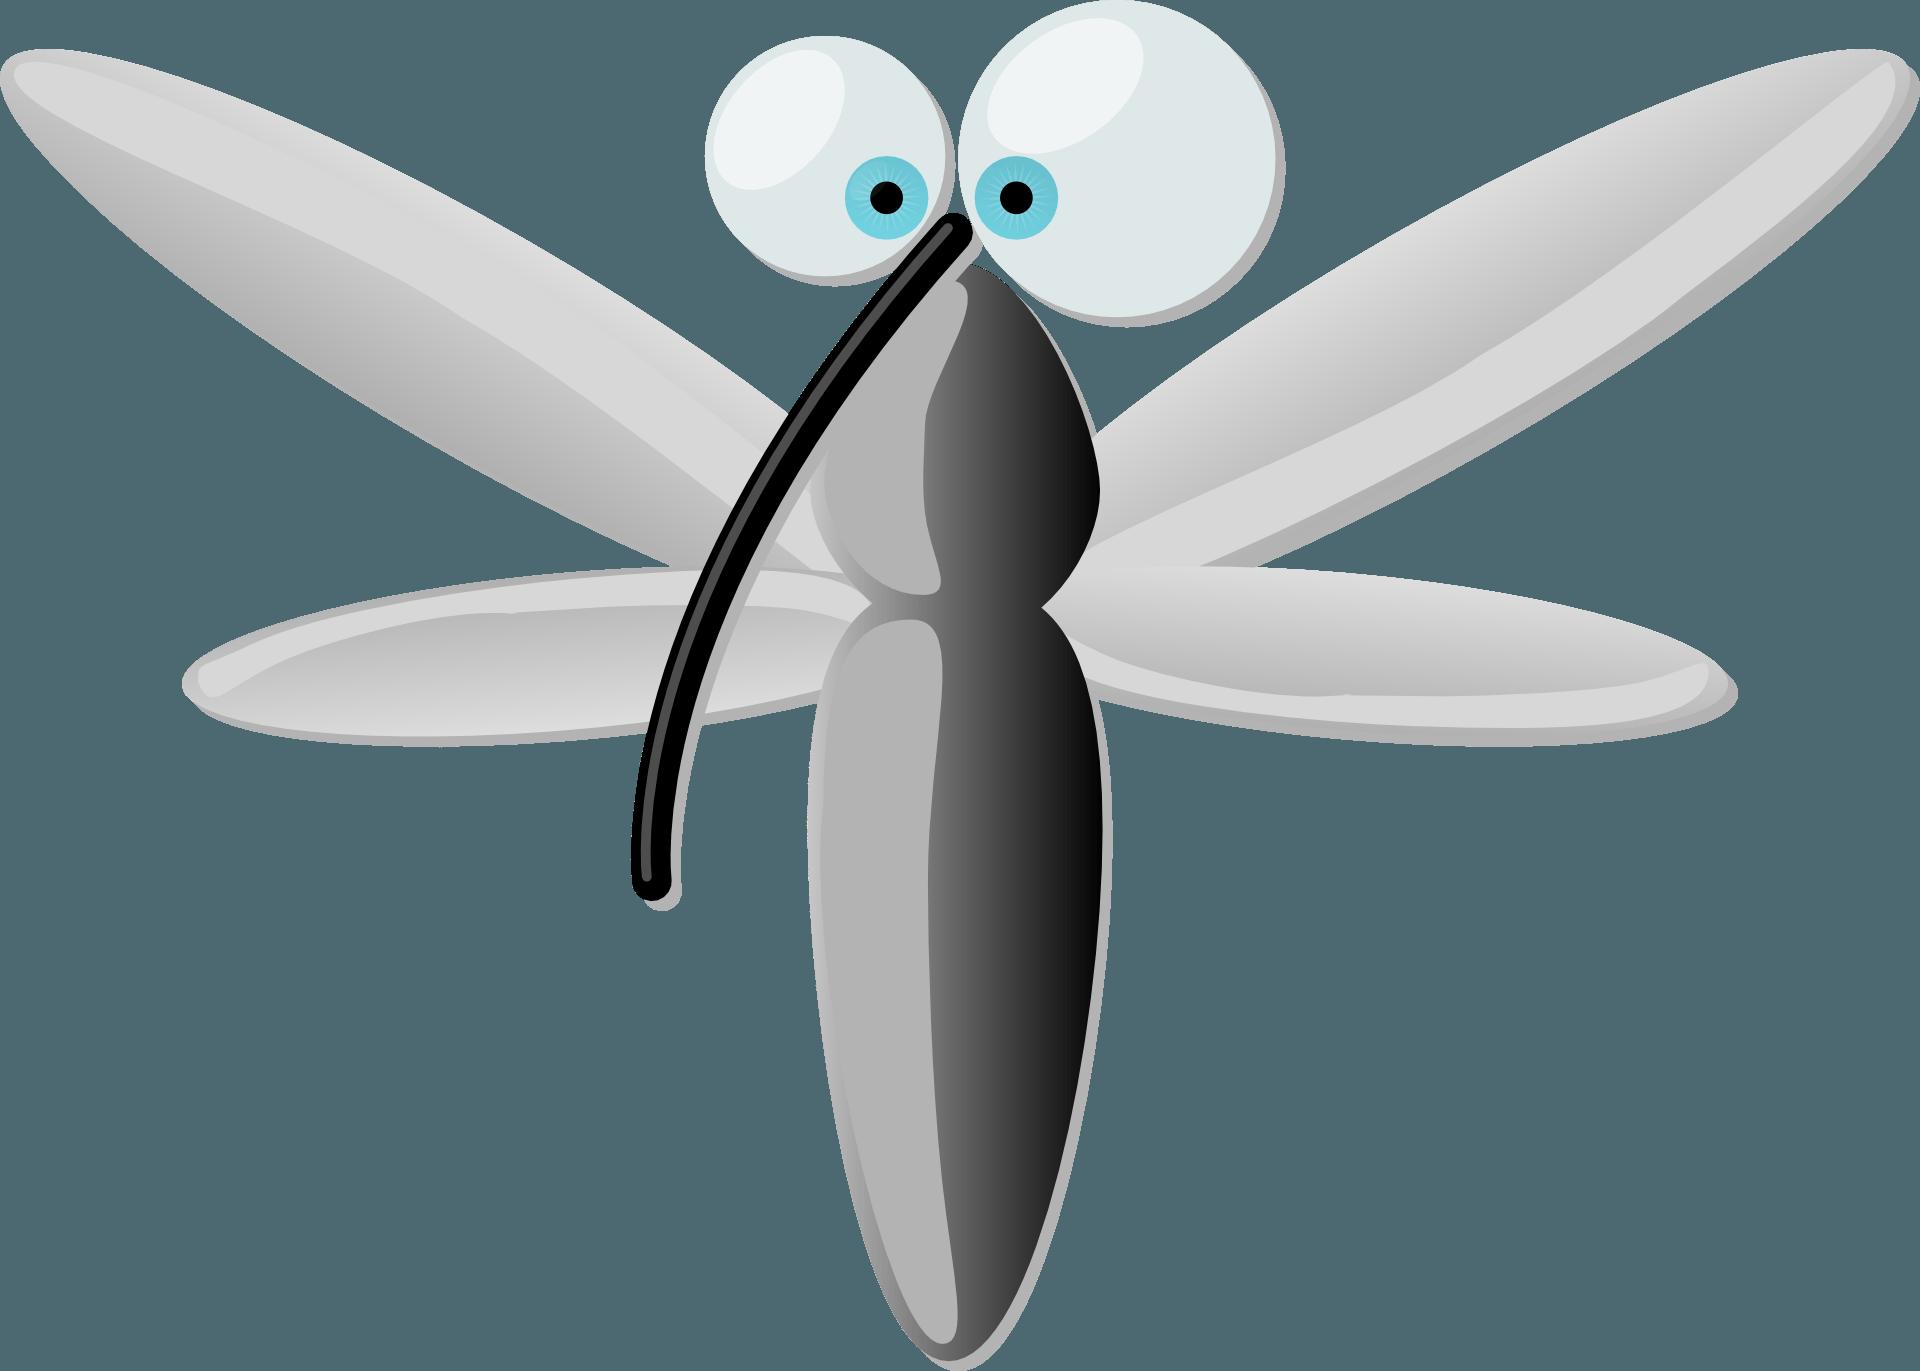 Sick of getting bit. Mosquito clipart bug repellent